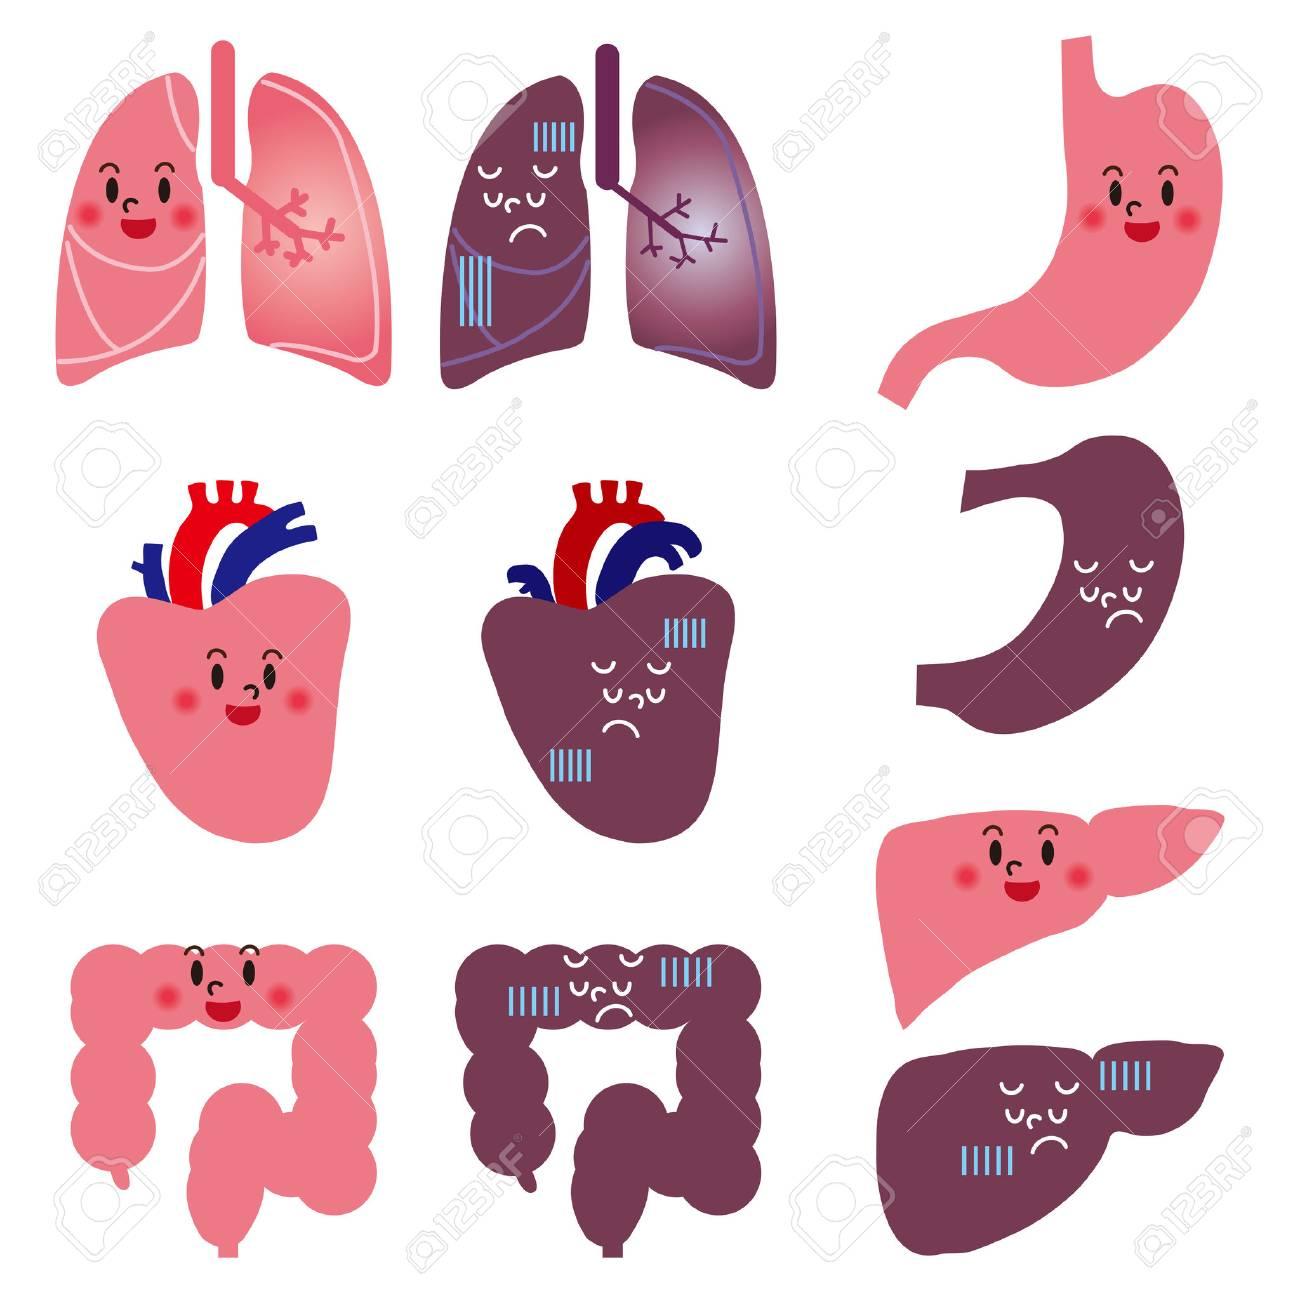 Character of human organs Stock Vector - 25513668